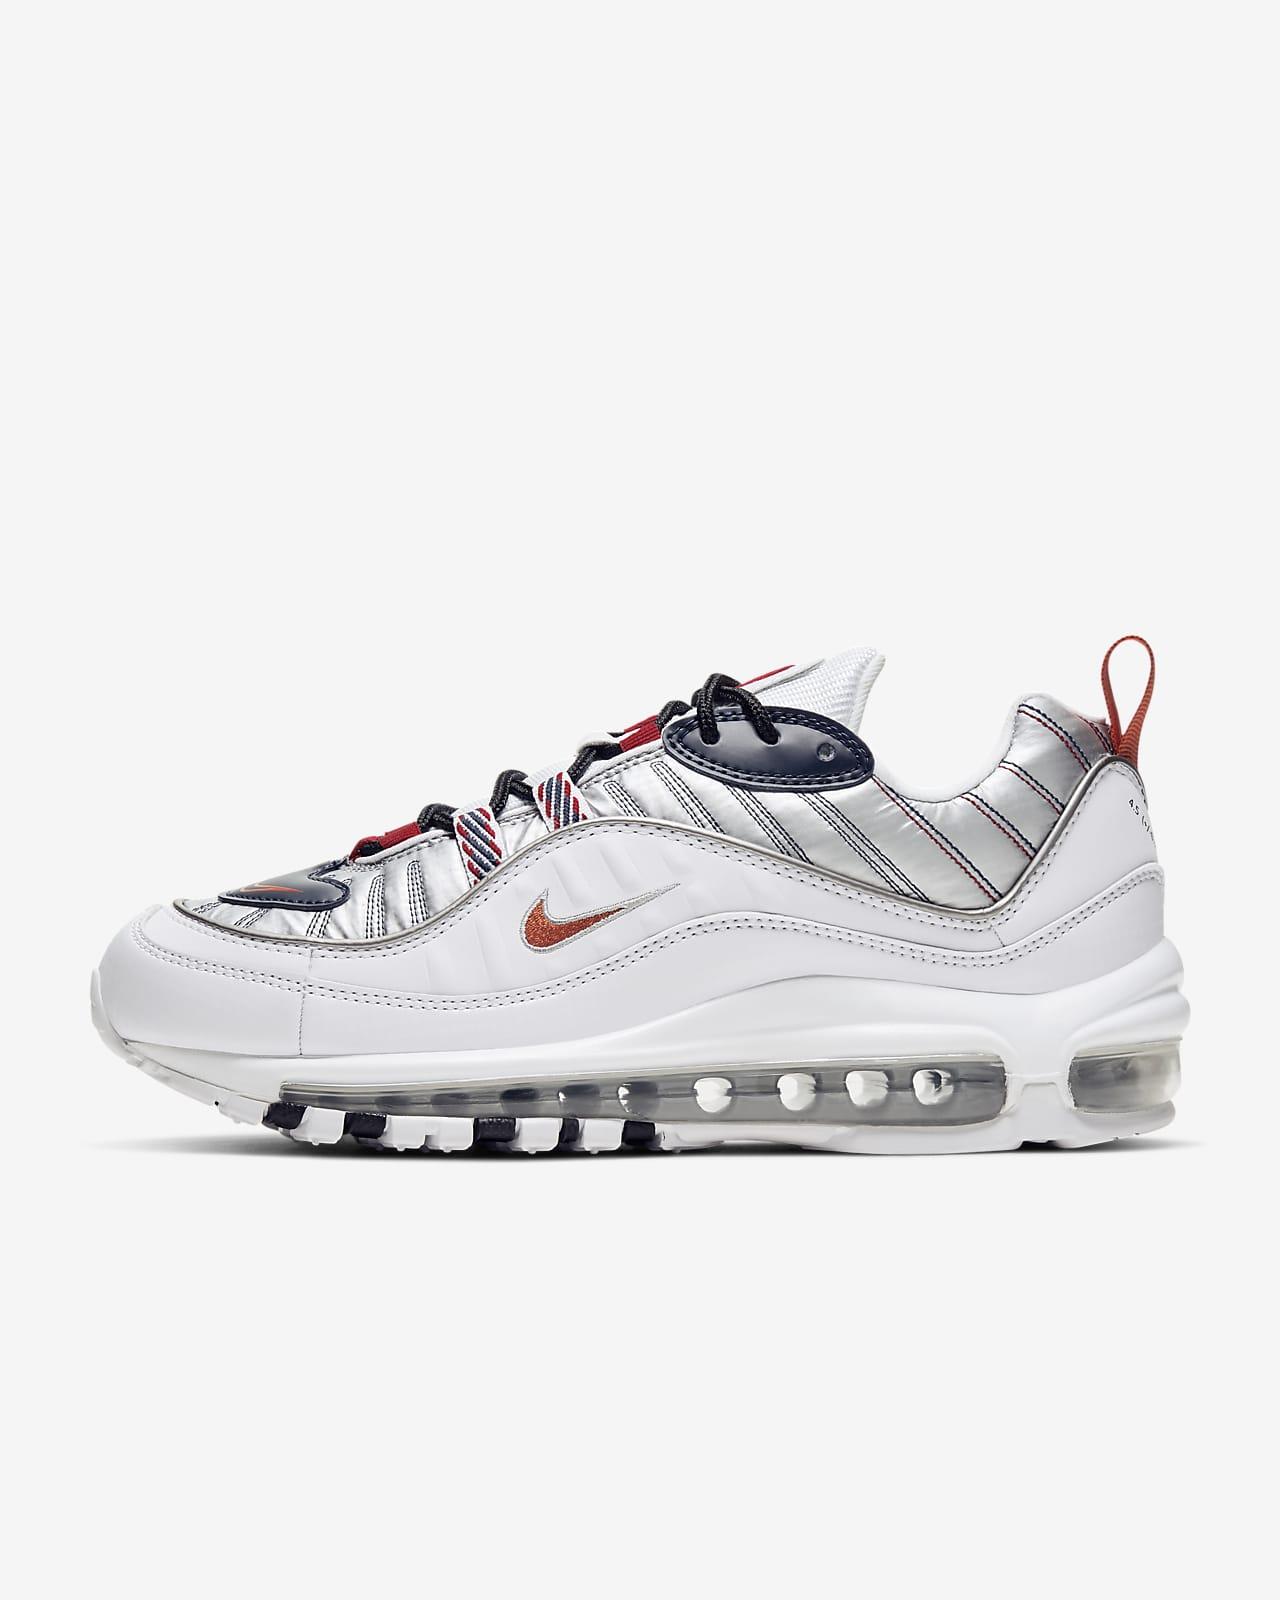 Nike Air Max 98 Premium Women's Shoe